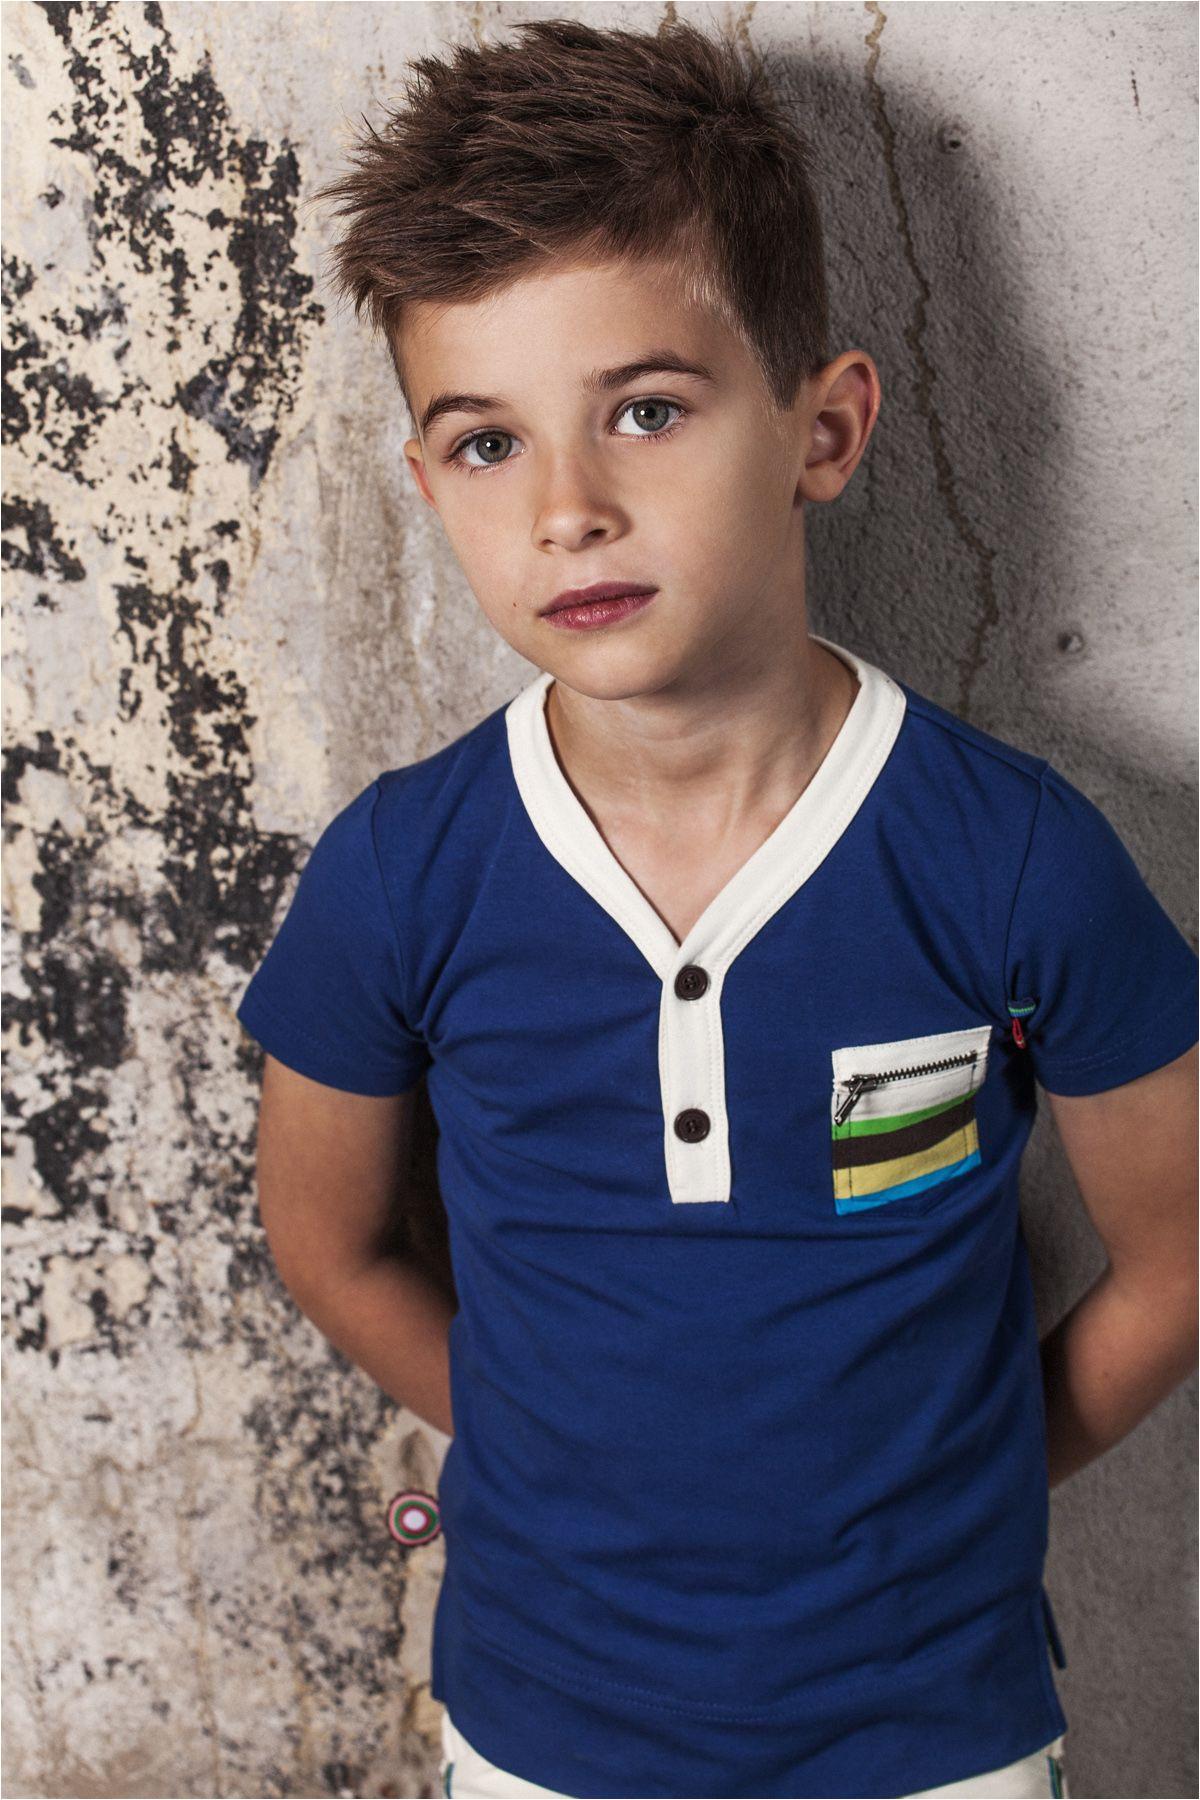 Adorable hair and shirt